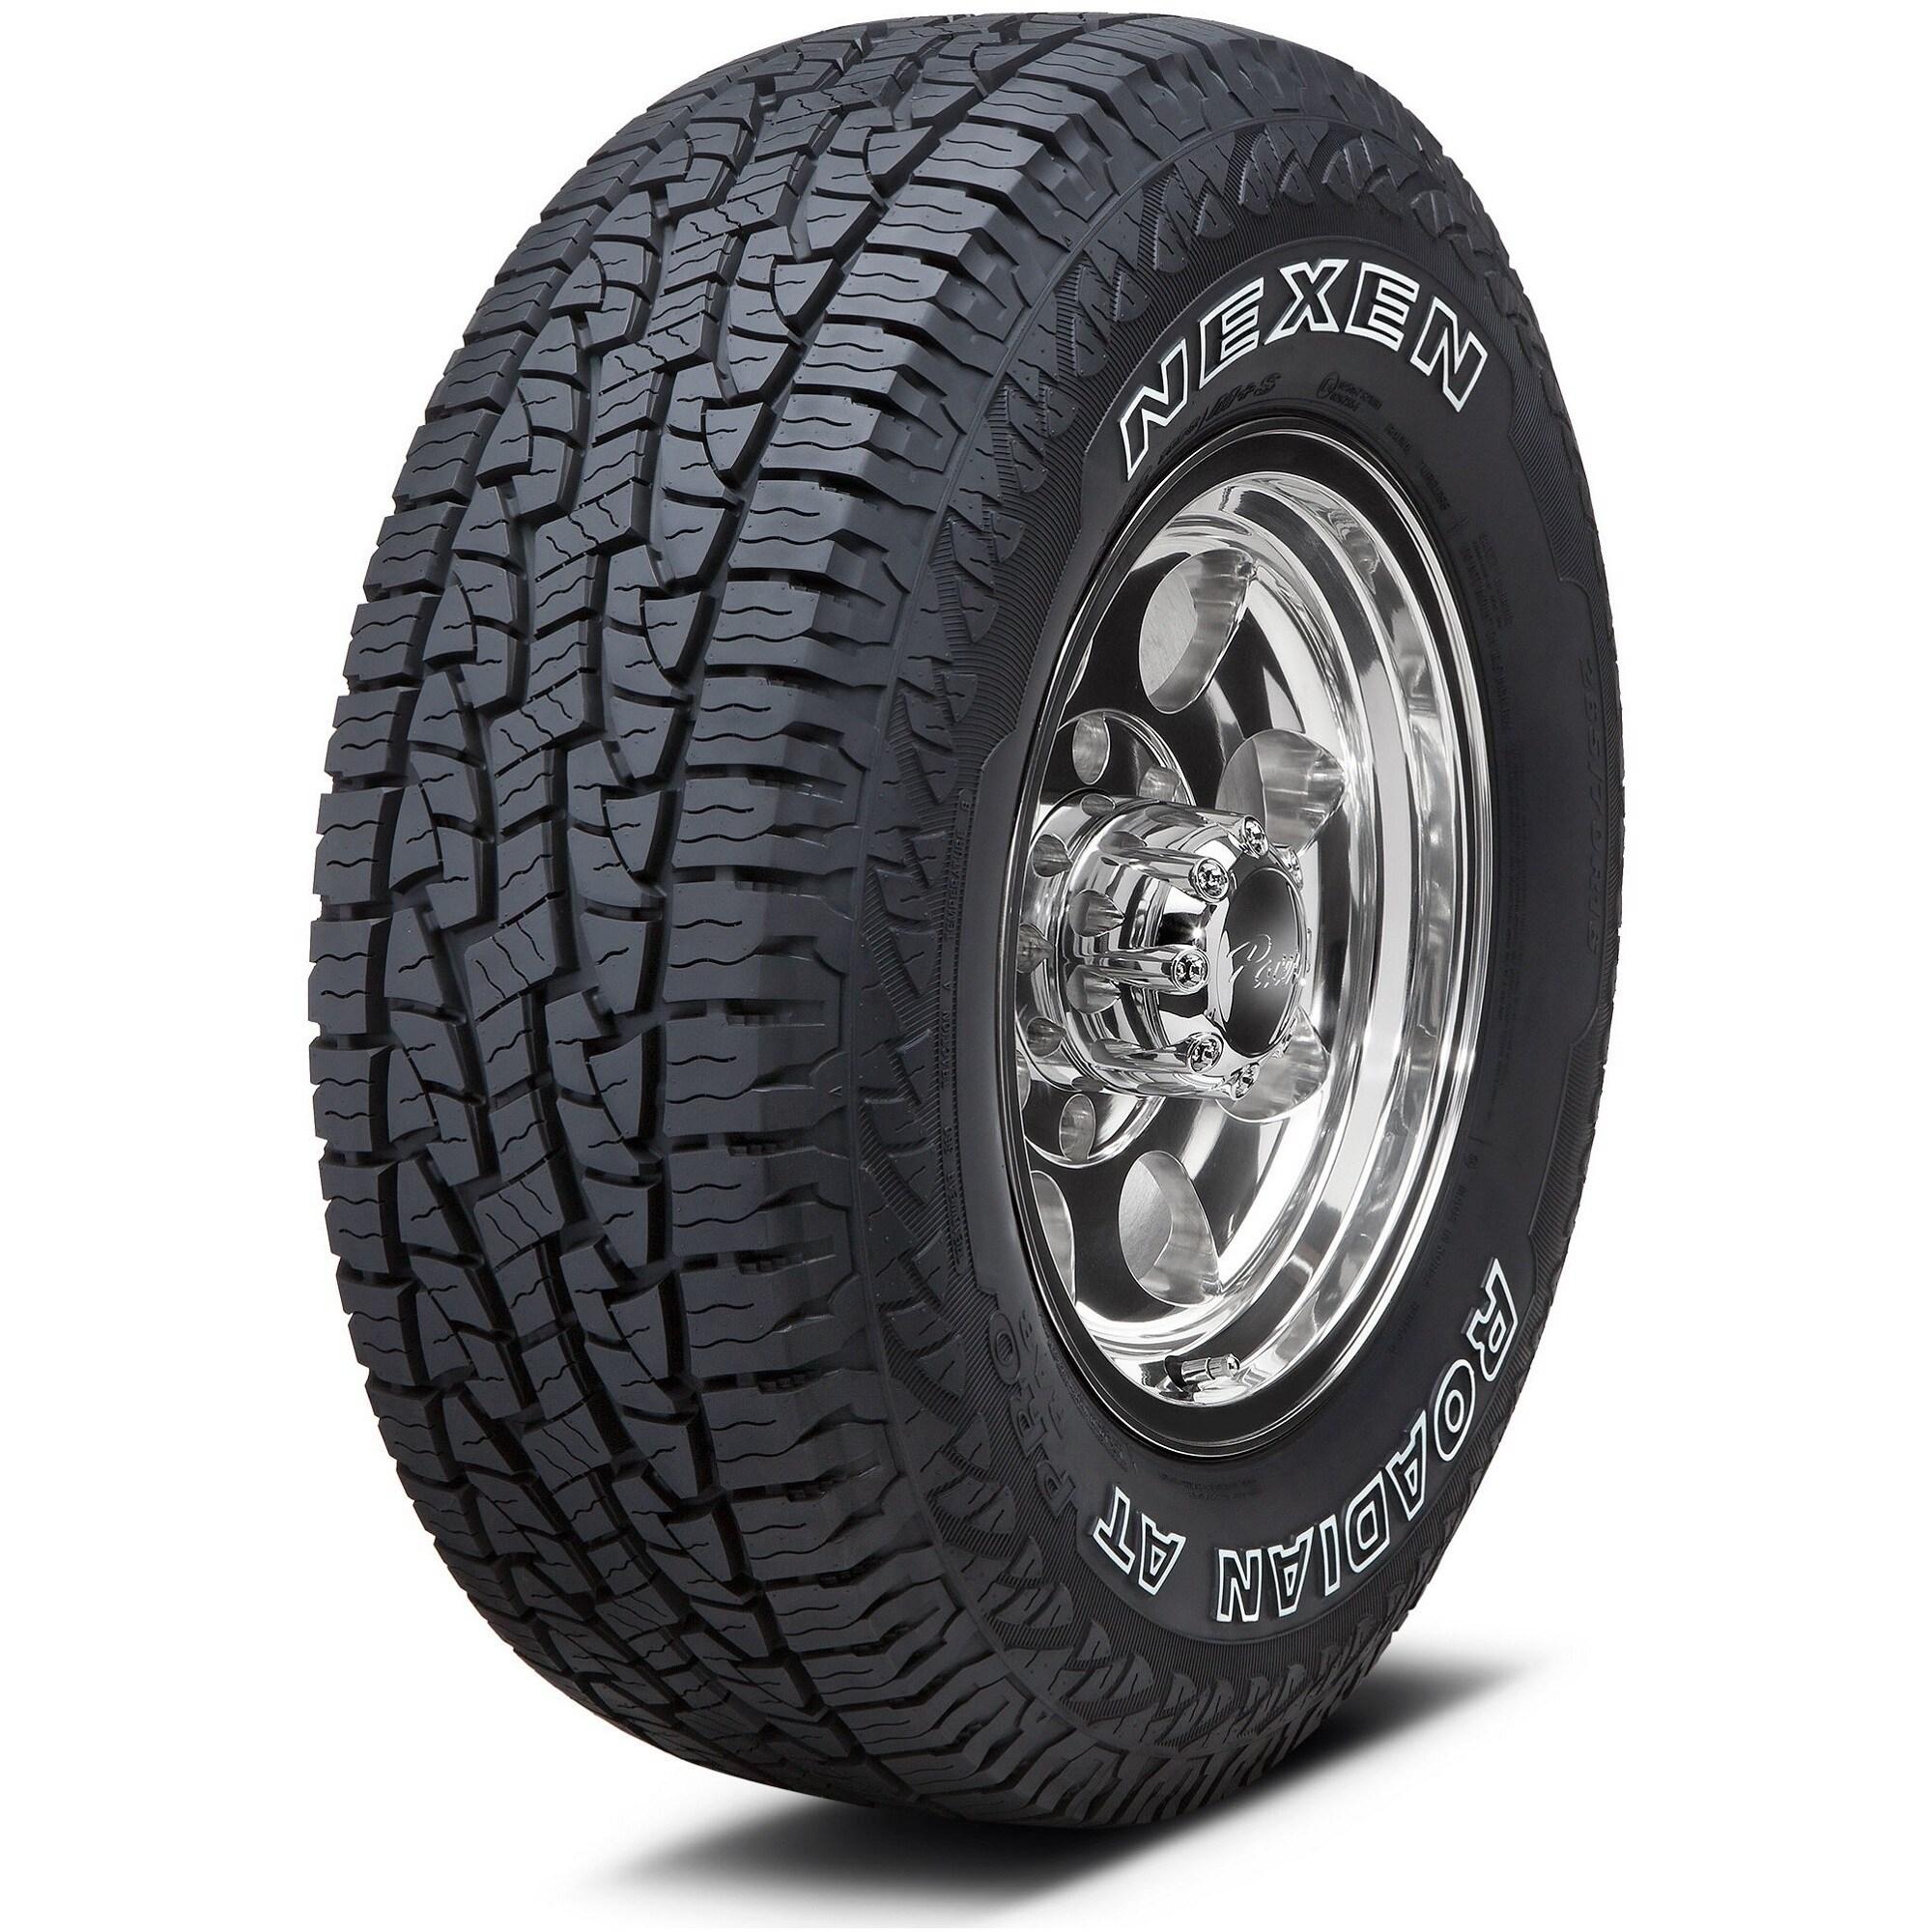 Nexen Roadian AT Pro RA8 All Terrain Tire - 265/70R16 112...